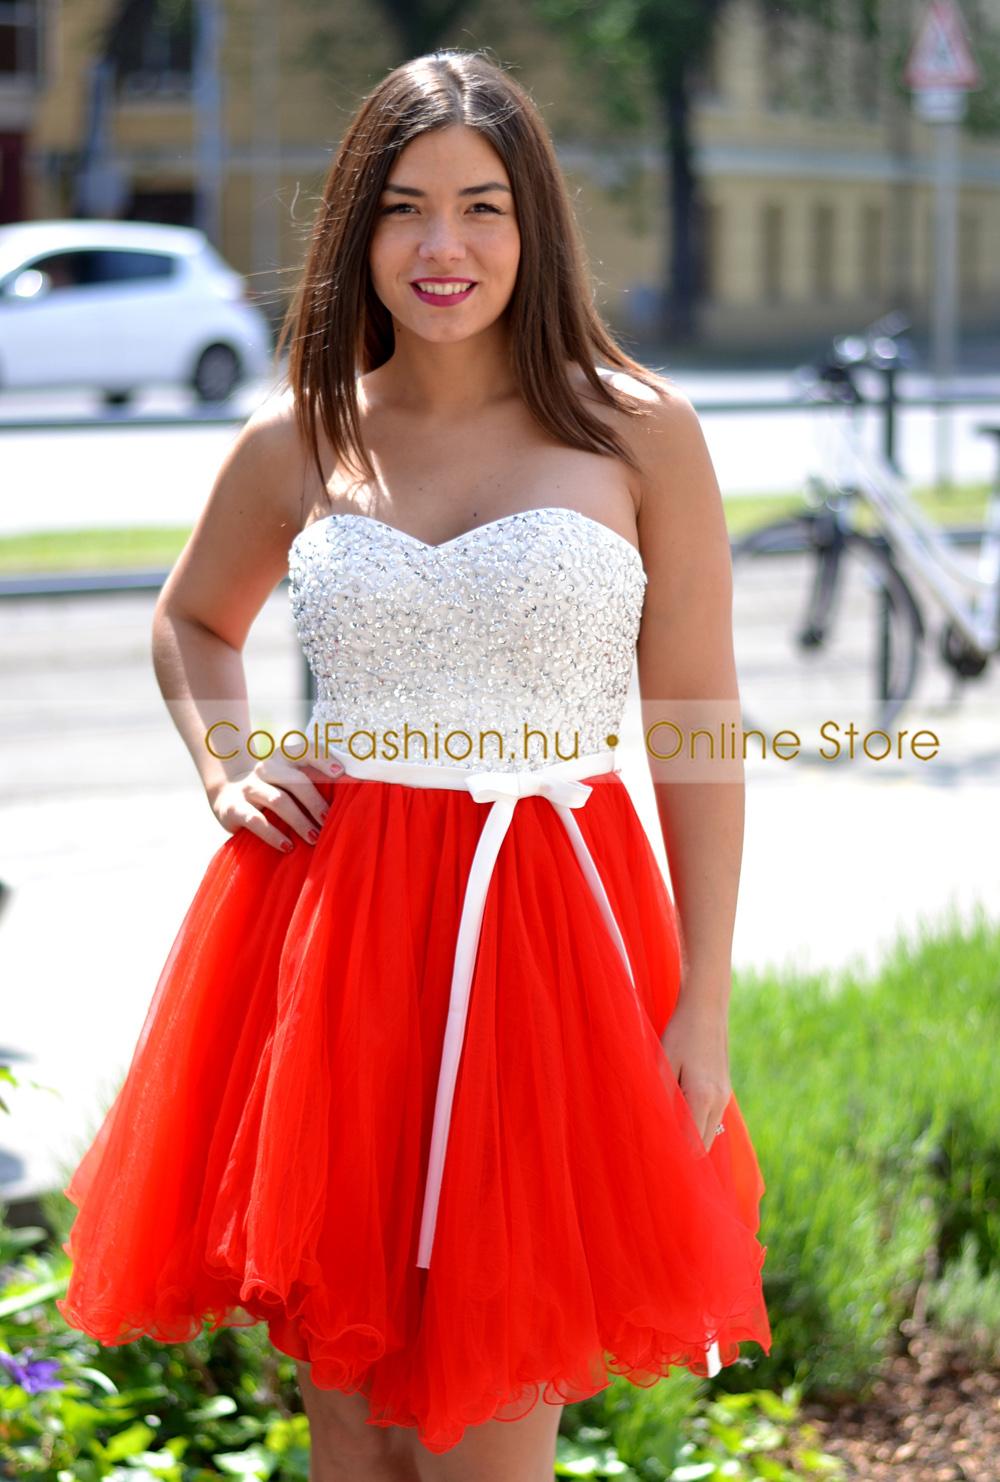 f2793ac422 Köves fehér-piros tüll ruha - Cool Fashion